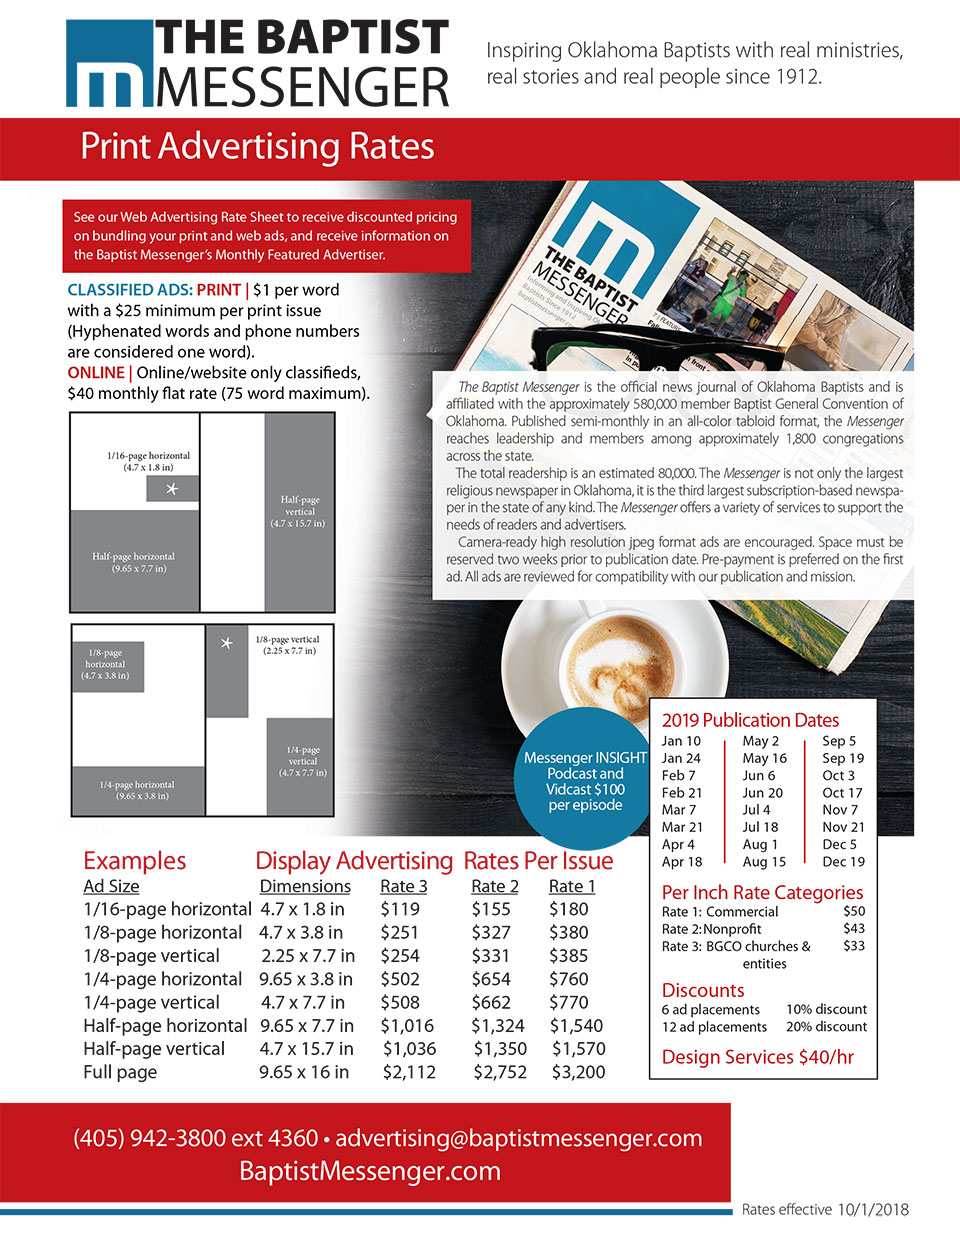 Print Advertising Rates | Baptist Messenger of Oklahoma